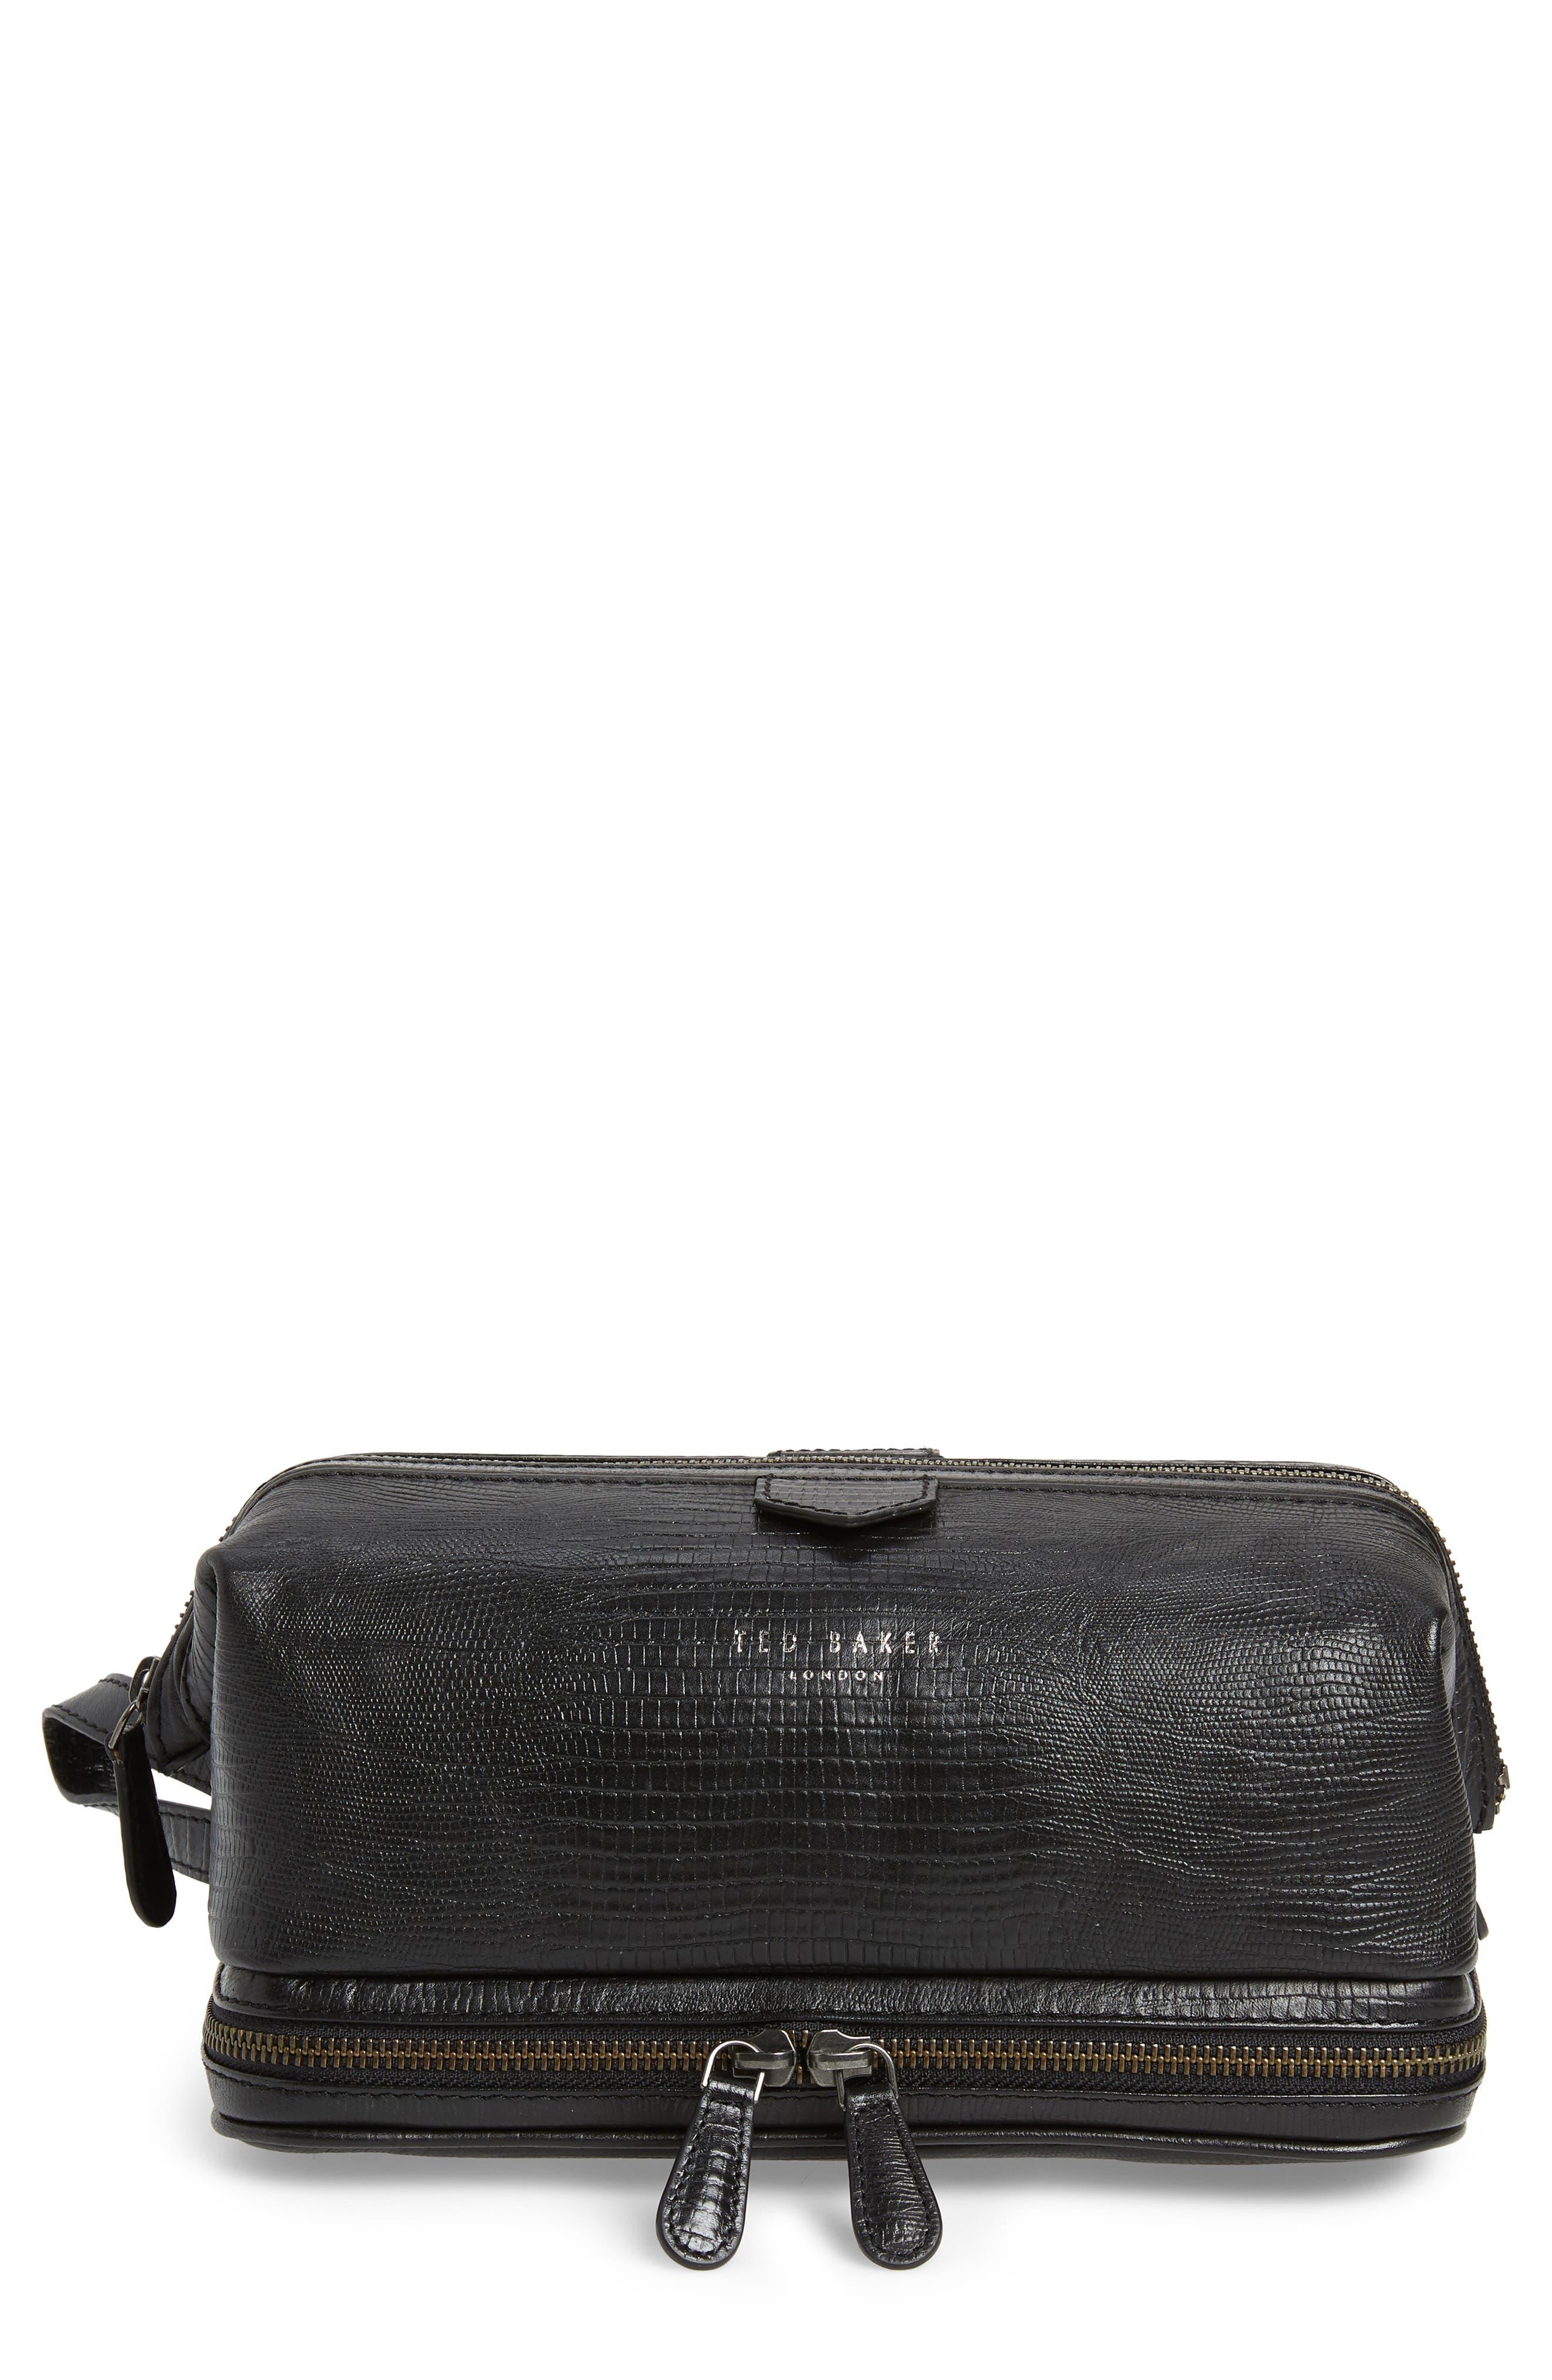 TED BAKER LONDON Leather Travel Kit, Main, color, BLACK